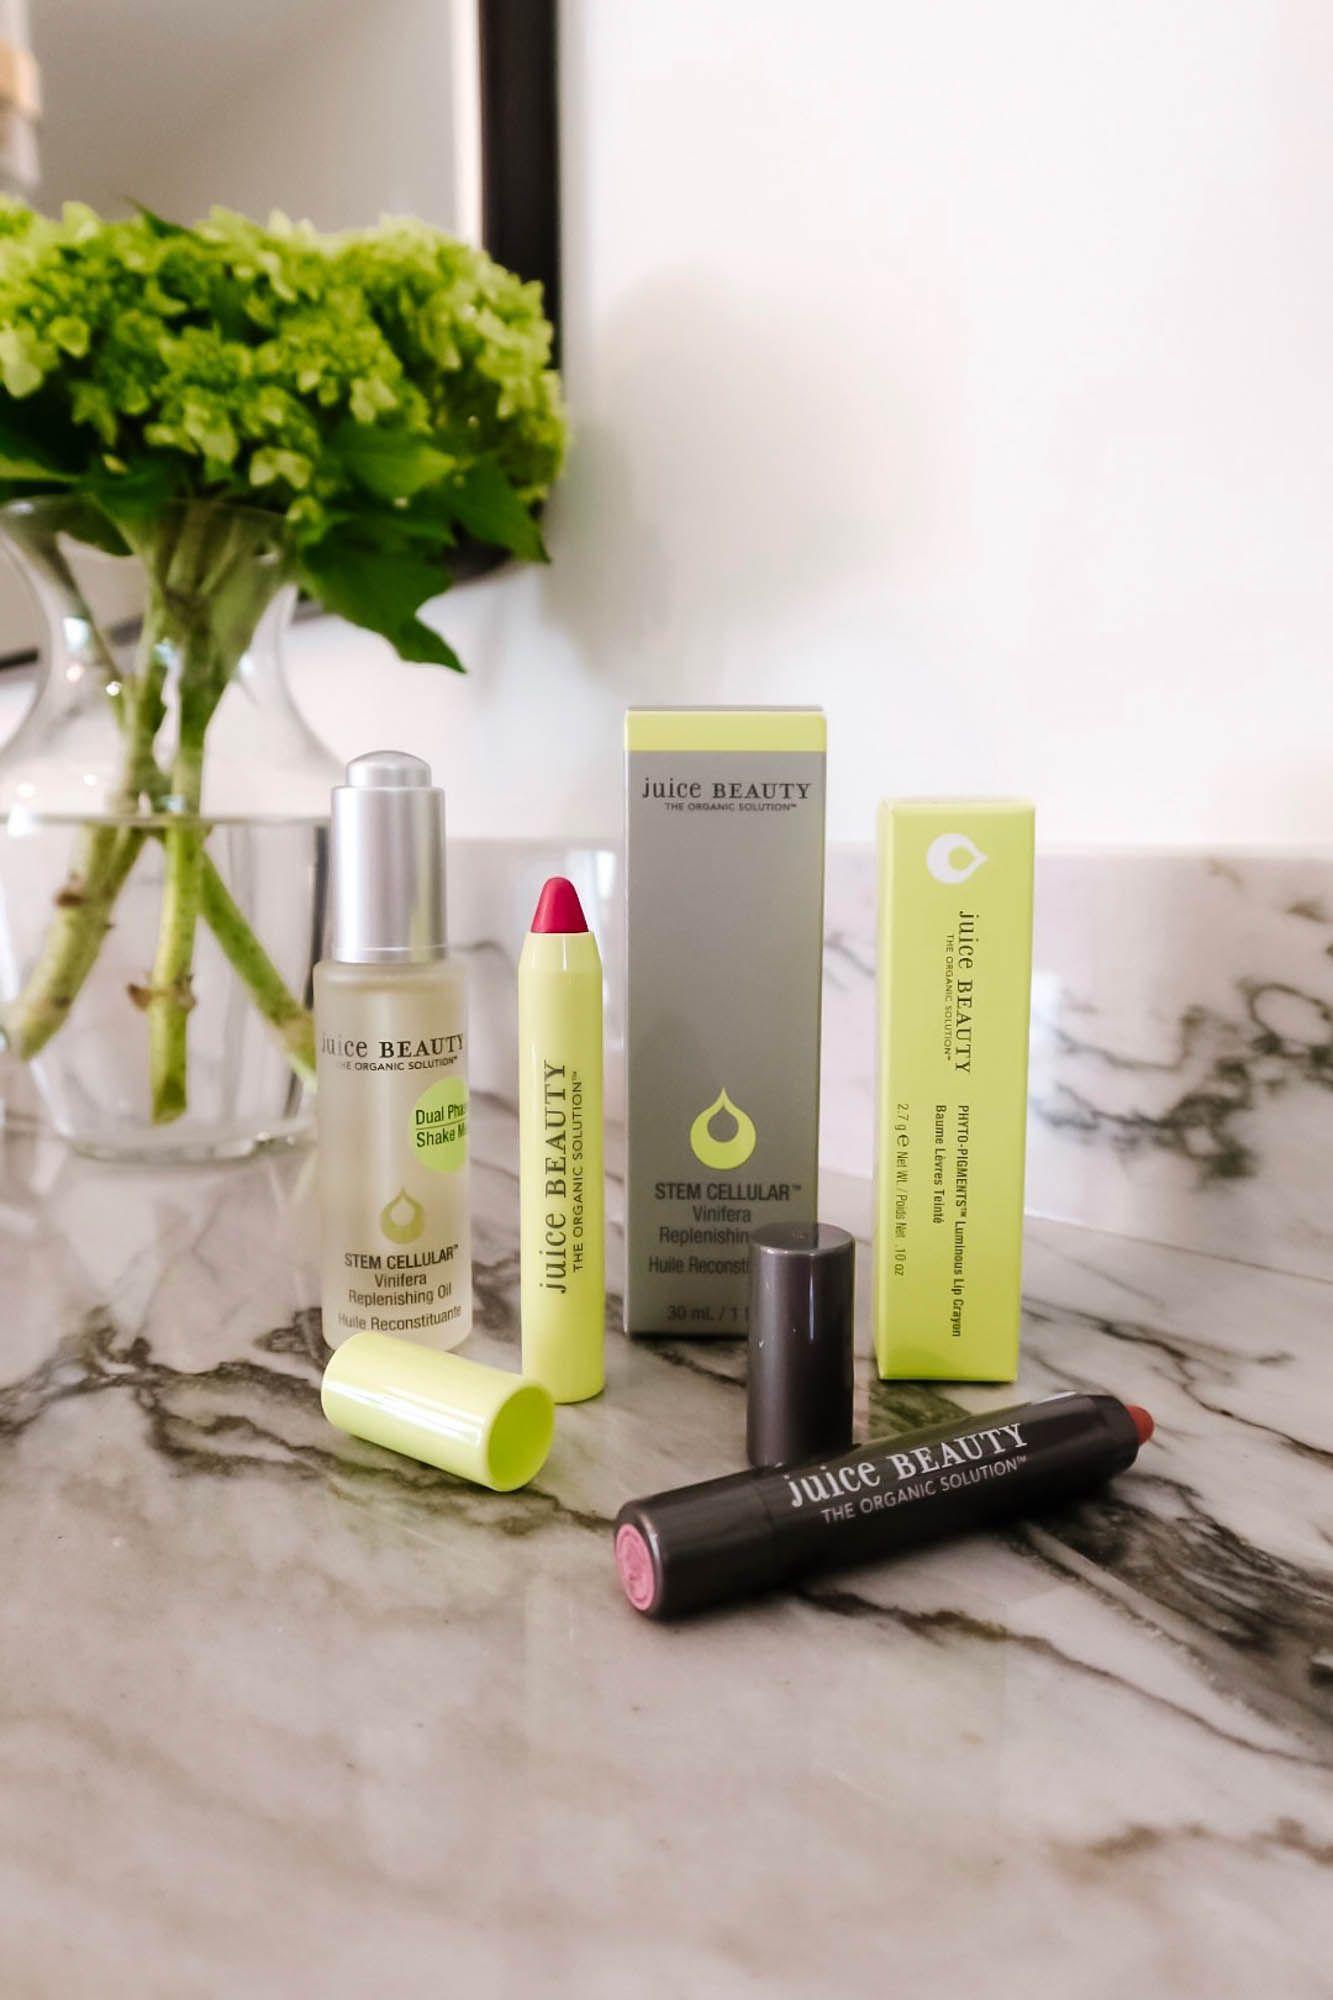 Juice Beauty New Arrivals — Cristin Cooper in 2020 | Juice ...